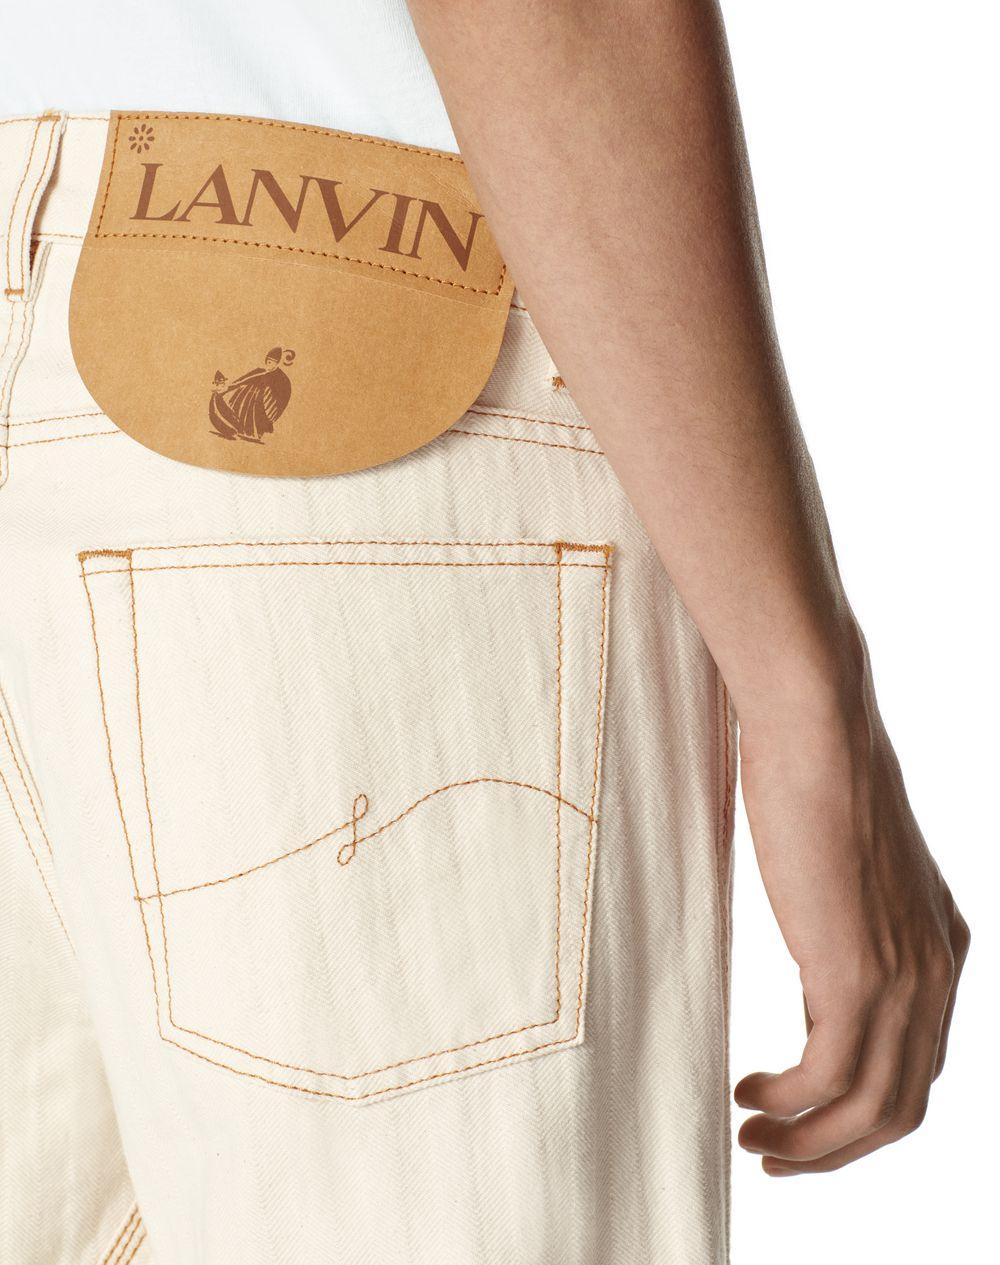 DENIM TROUSERS - Lanvin